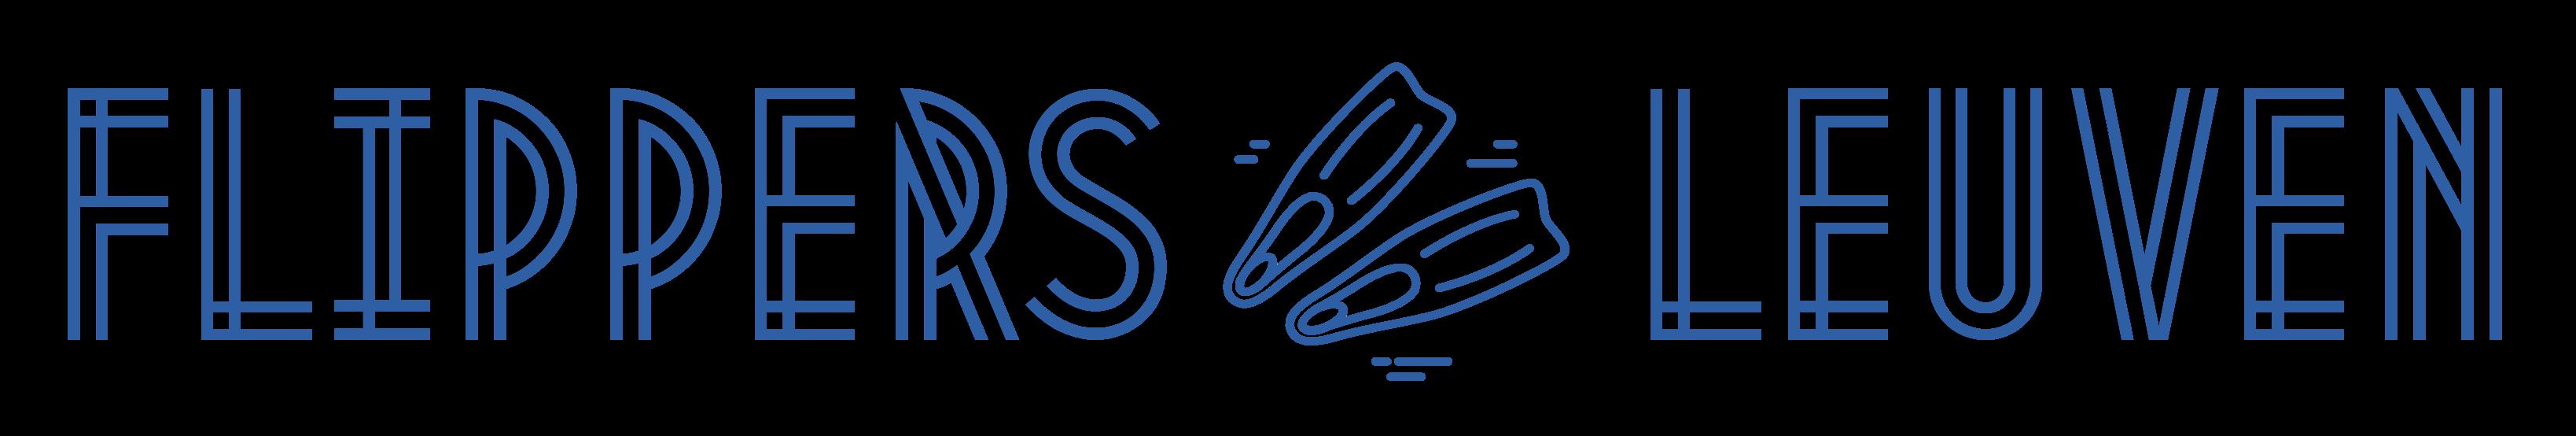 Flippers Leuven logo